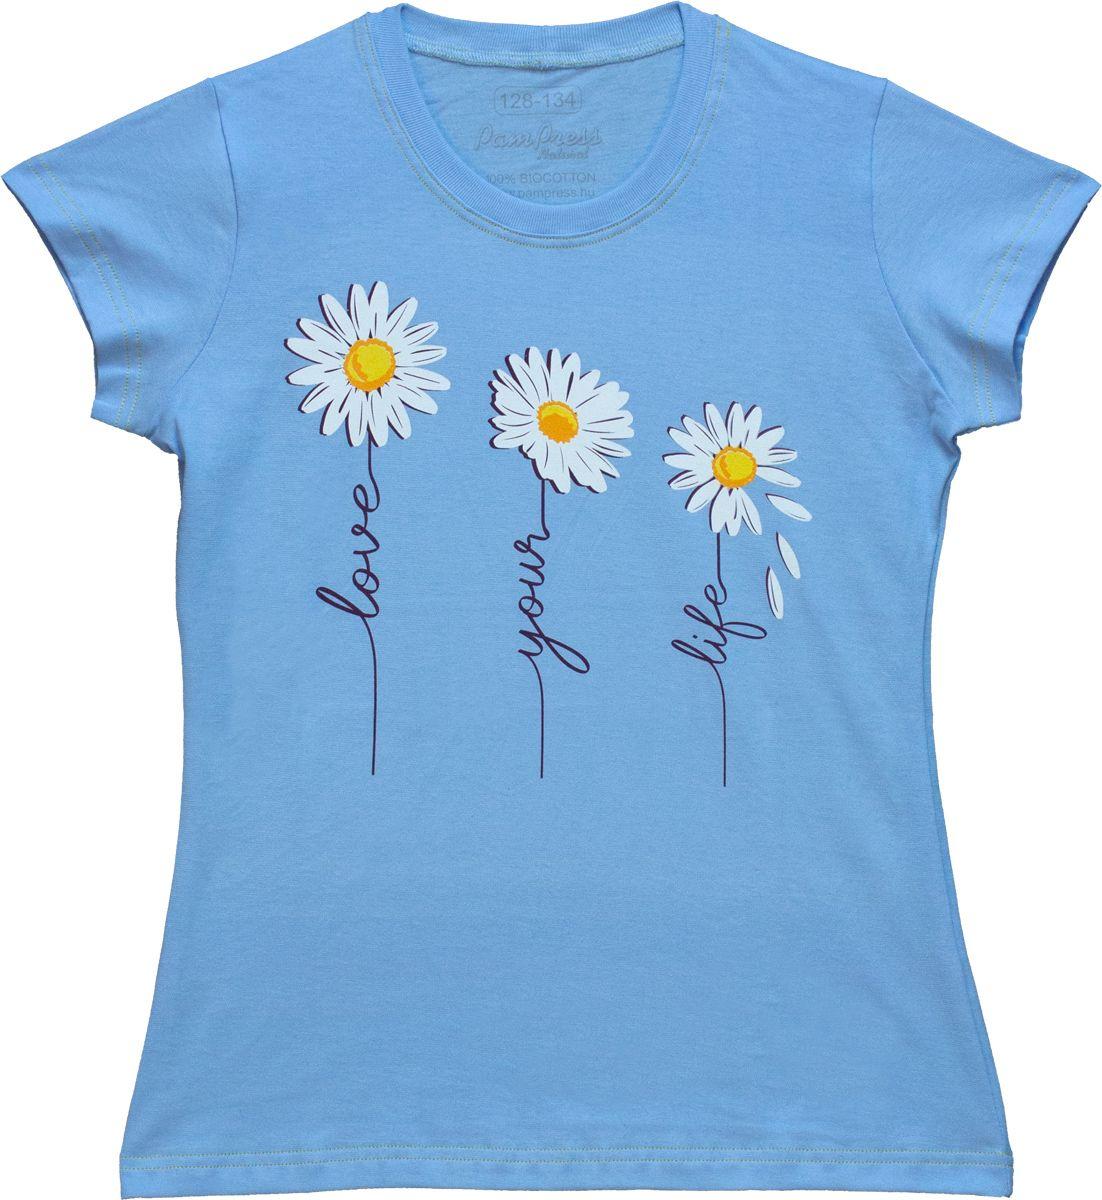 Lány rövid ujjú póló (Margaréta virág) /RPVIR21034/